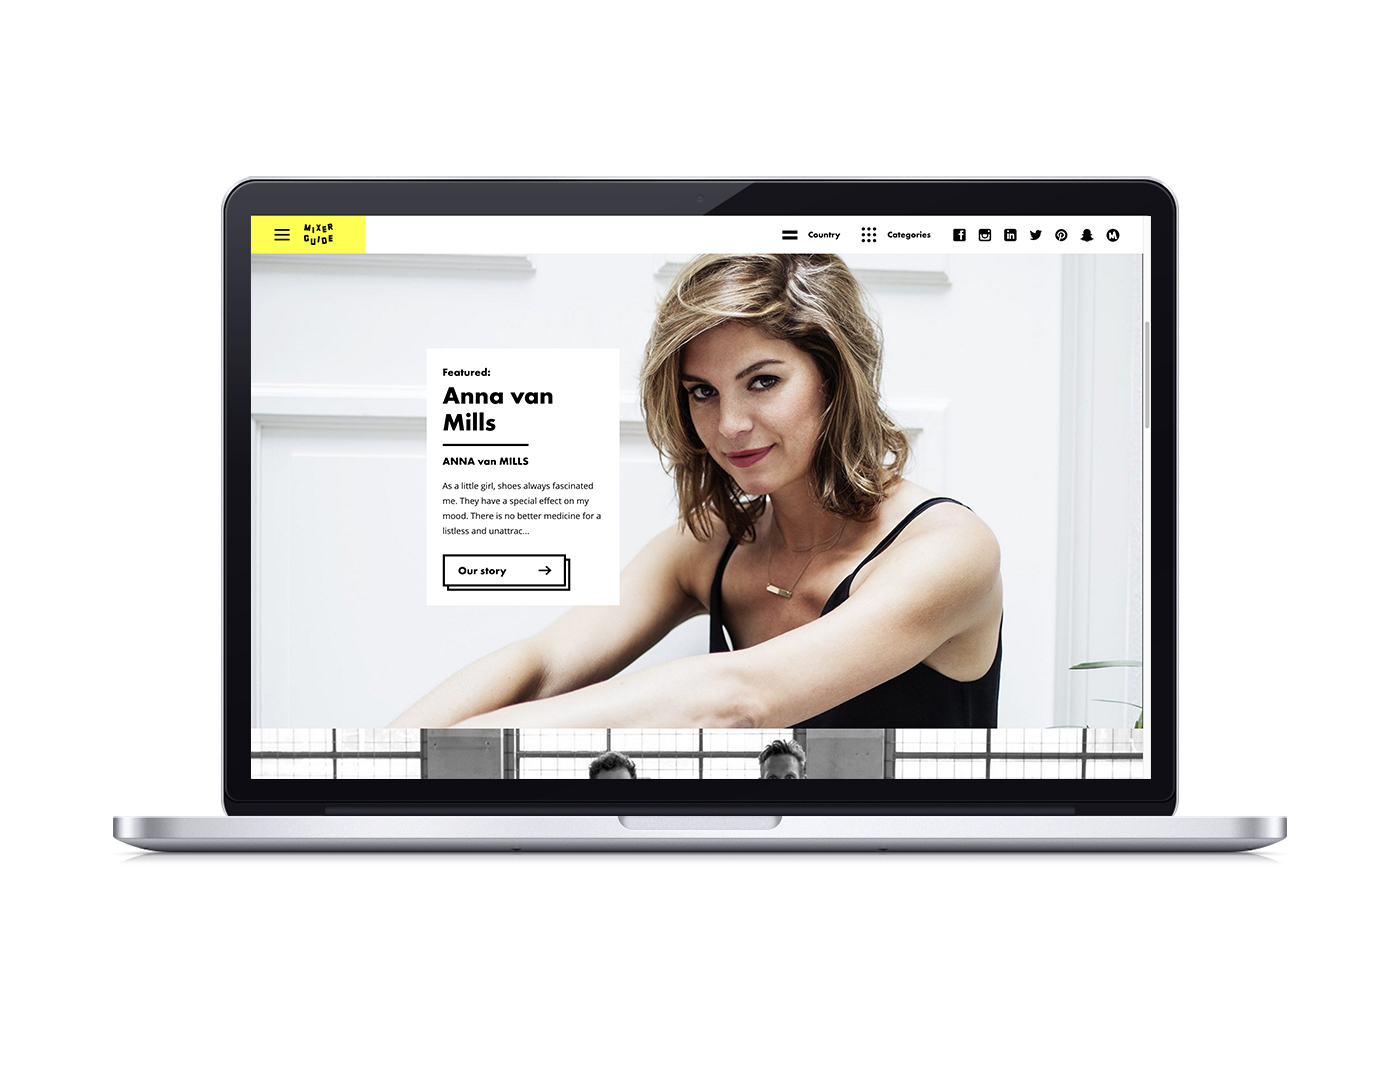 Mixerguide-homepage